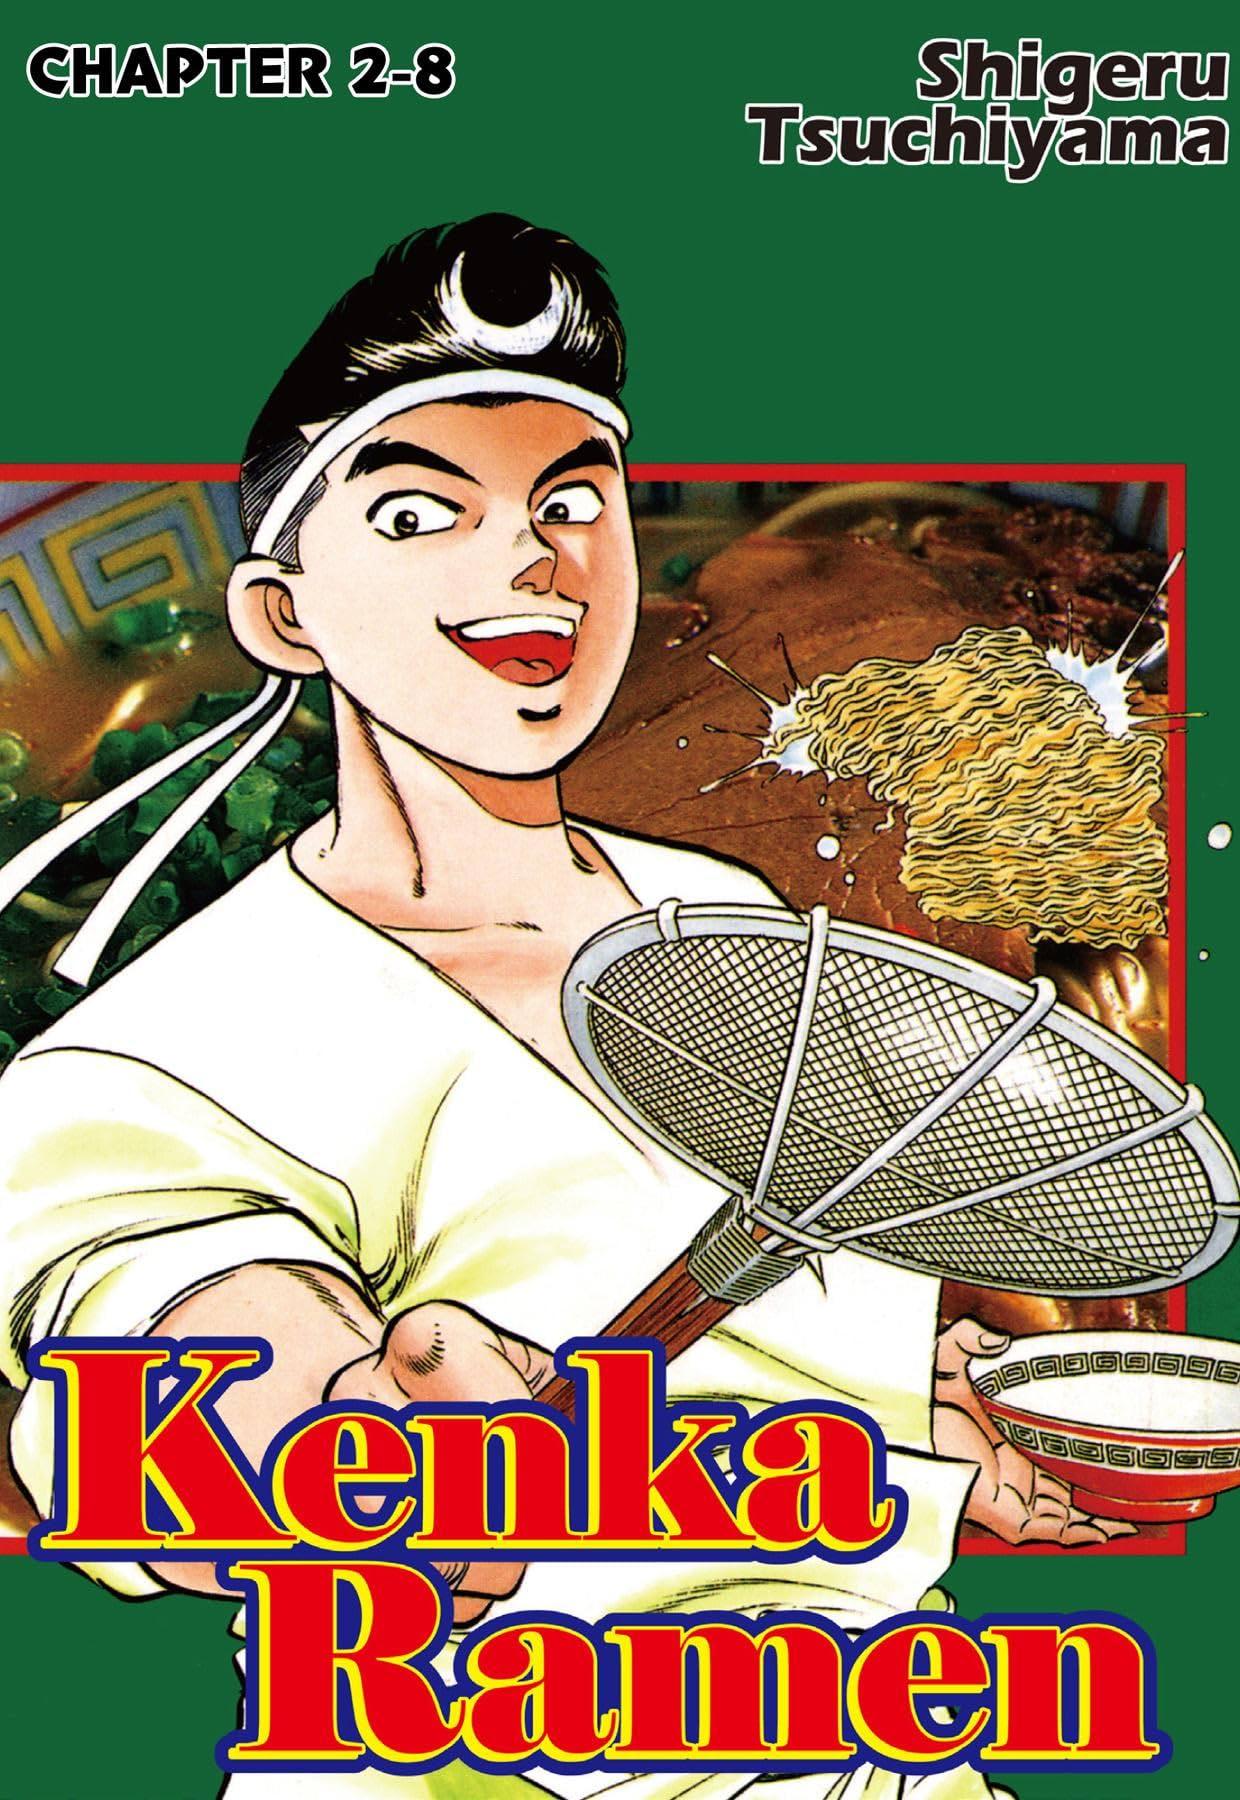 KENKA RAMEN #17